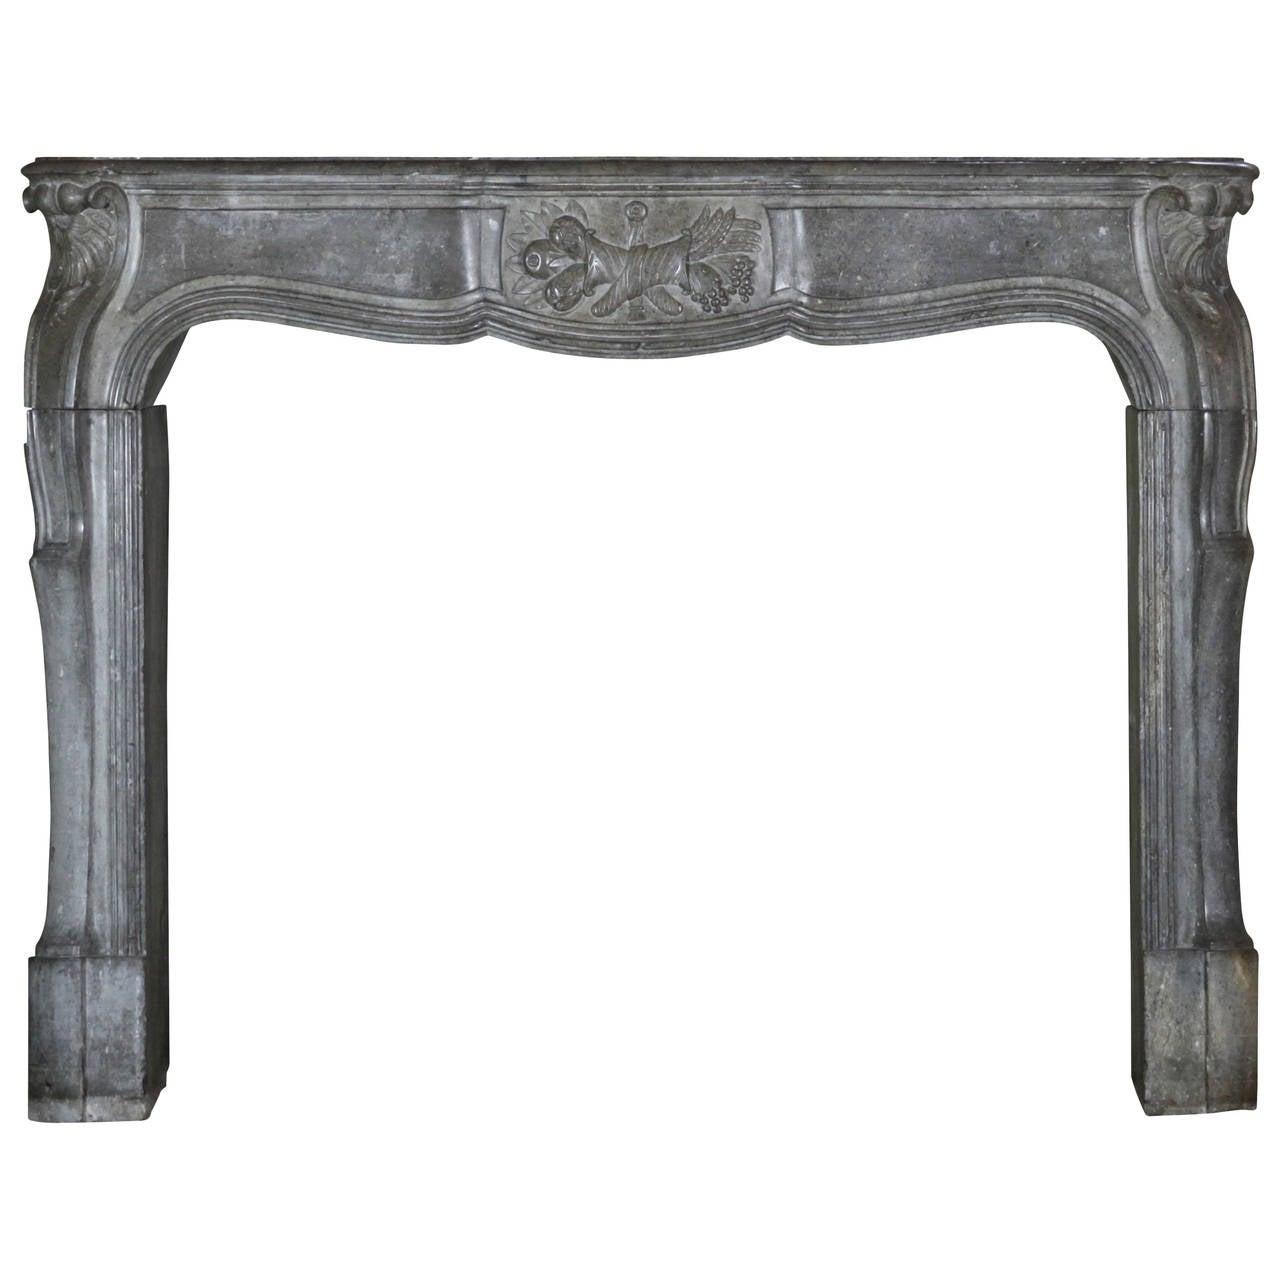 18th Century Louis XIV Transition Regency antique Fireplace Mantel